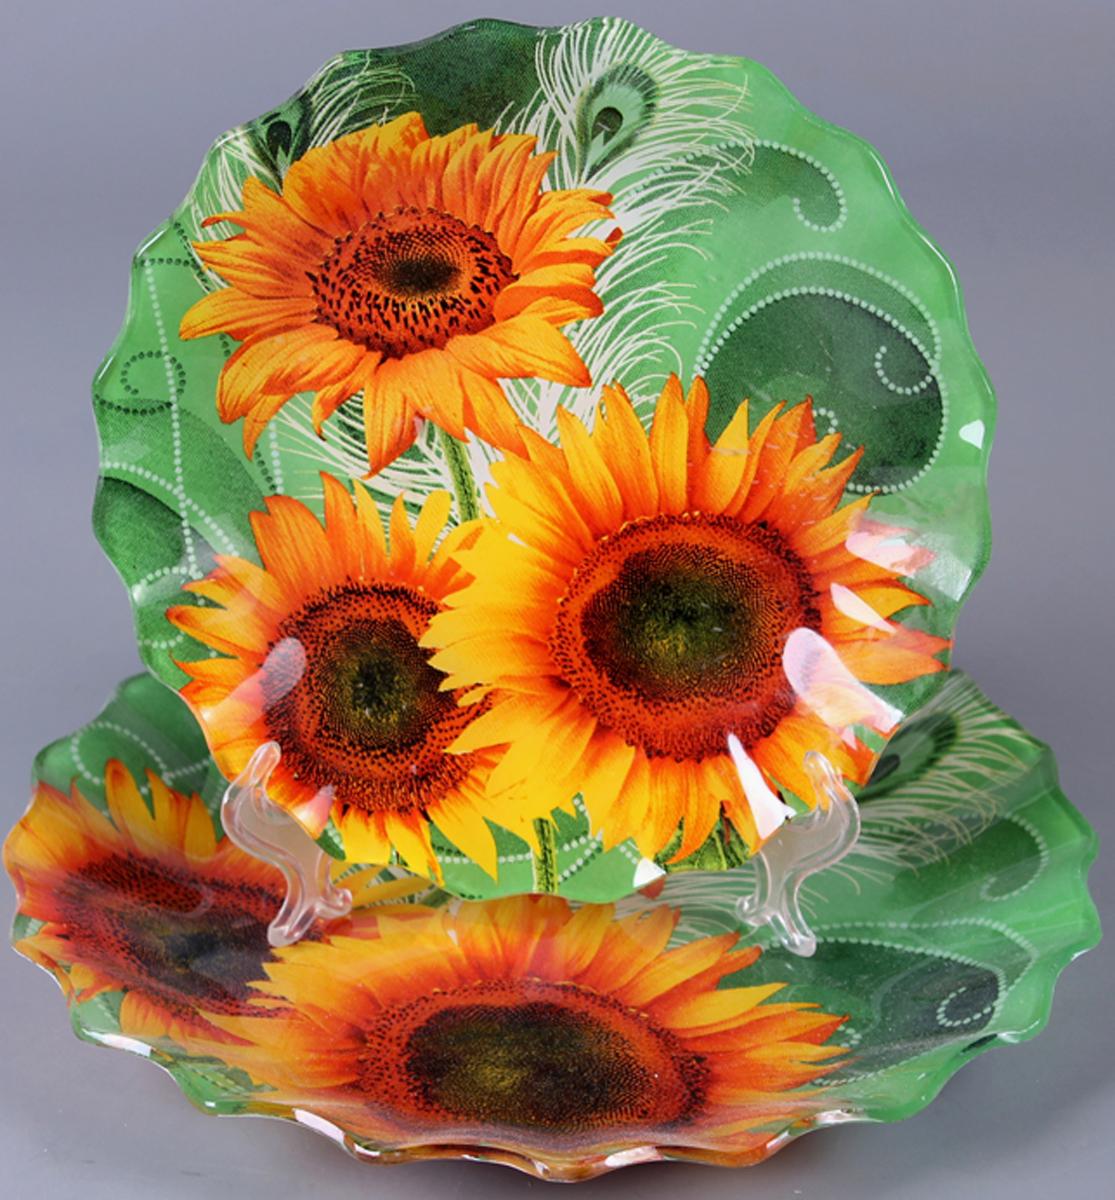 Набор блюд Olaff Цветы, 2 предмета. ZY-MD-TEXR-787 фруктовница olaff цветы 2 яруса zy md ecyb 794